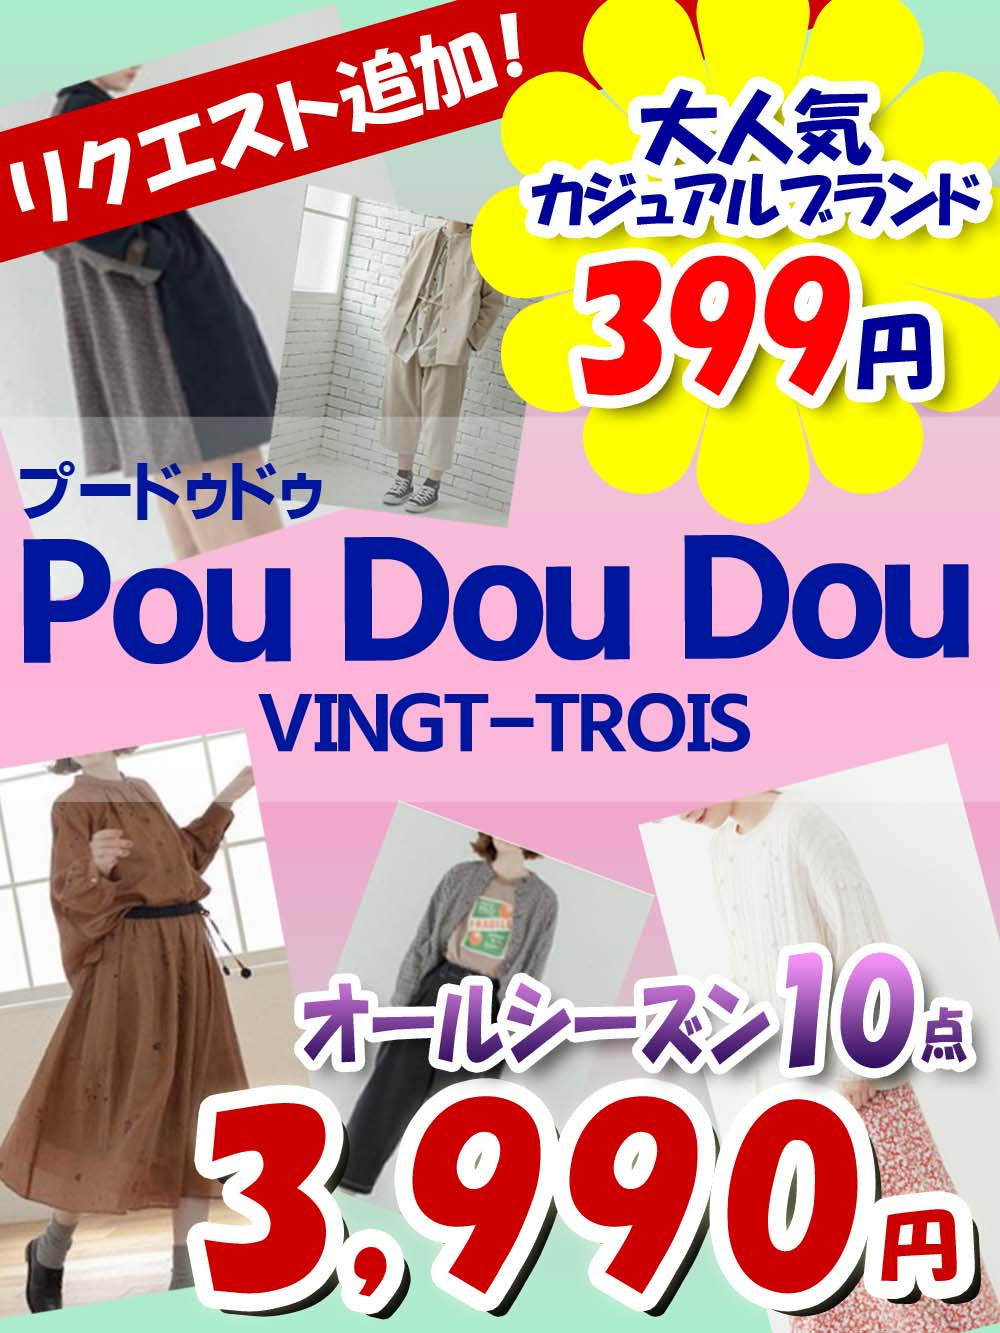 【Pou Dou Dou】カジュアルレディースアパレル雑貨アラカルト!10点【399円】